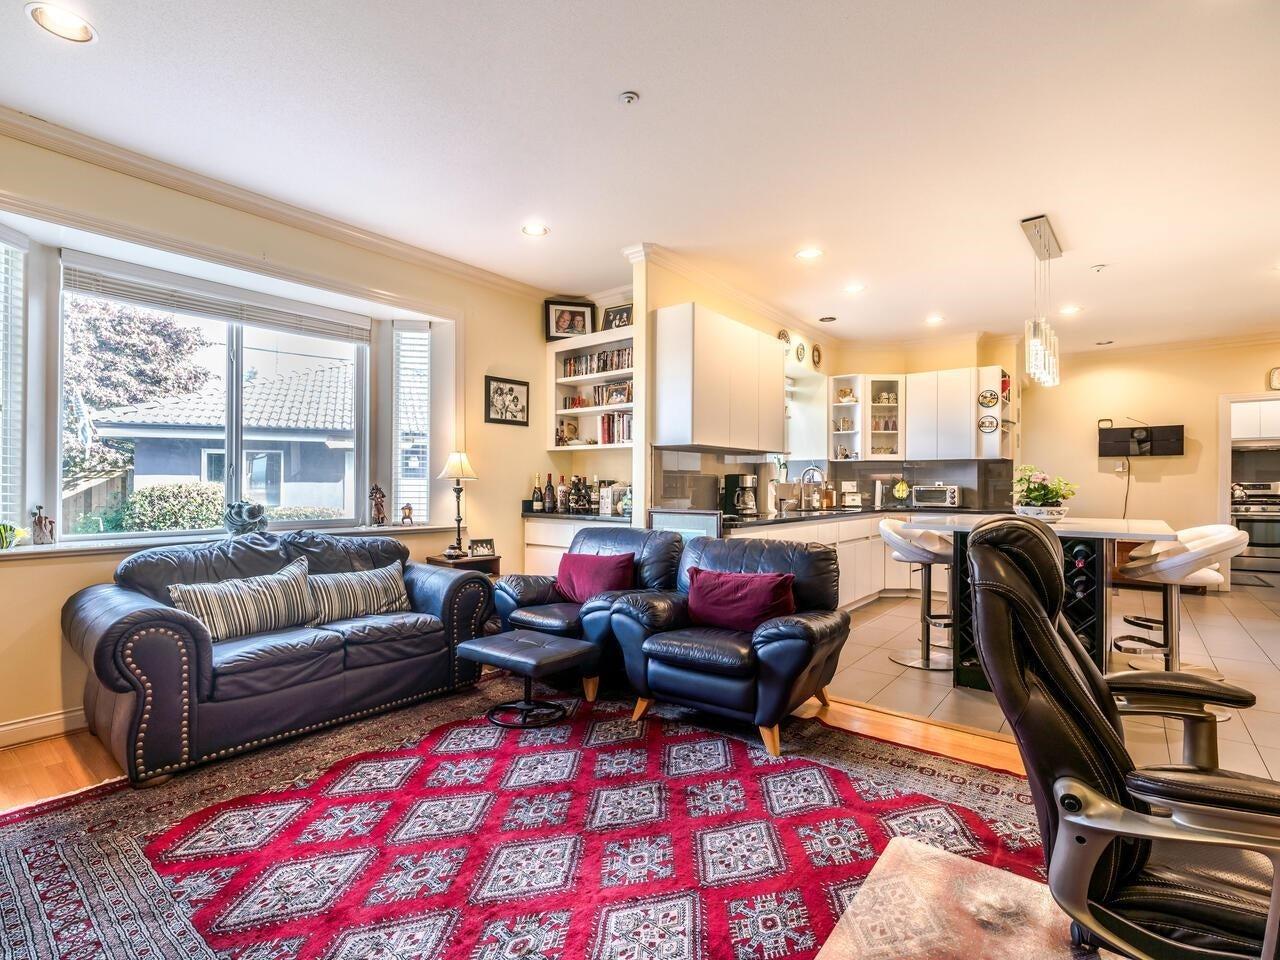 7888 JASPER CRESCENT - Fraserview VE House/Single Family for sale, 7 Bedrooms (R2622945) - #12